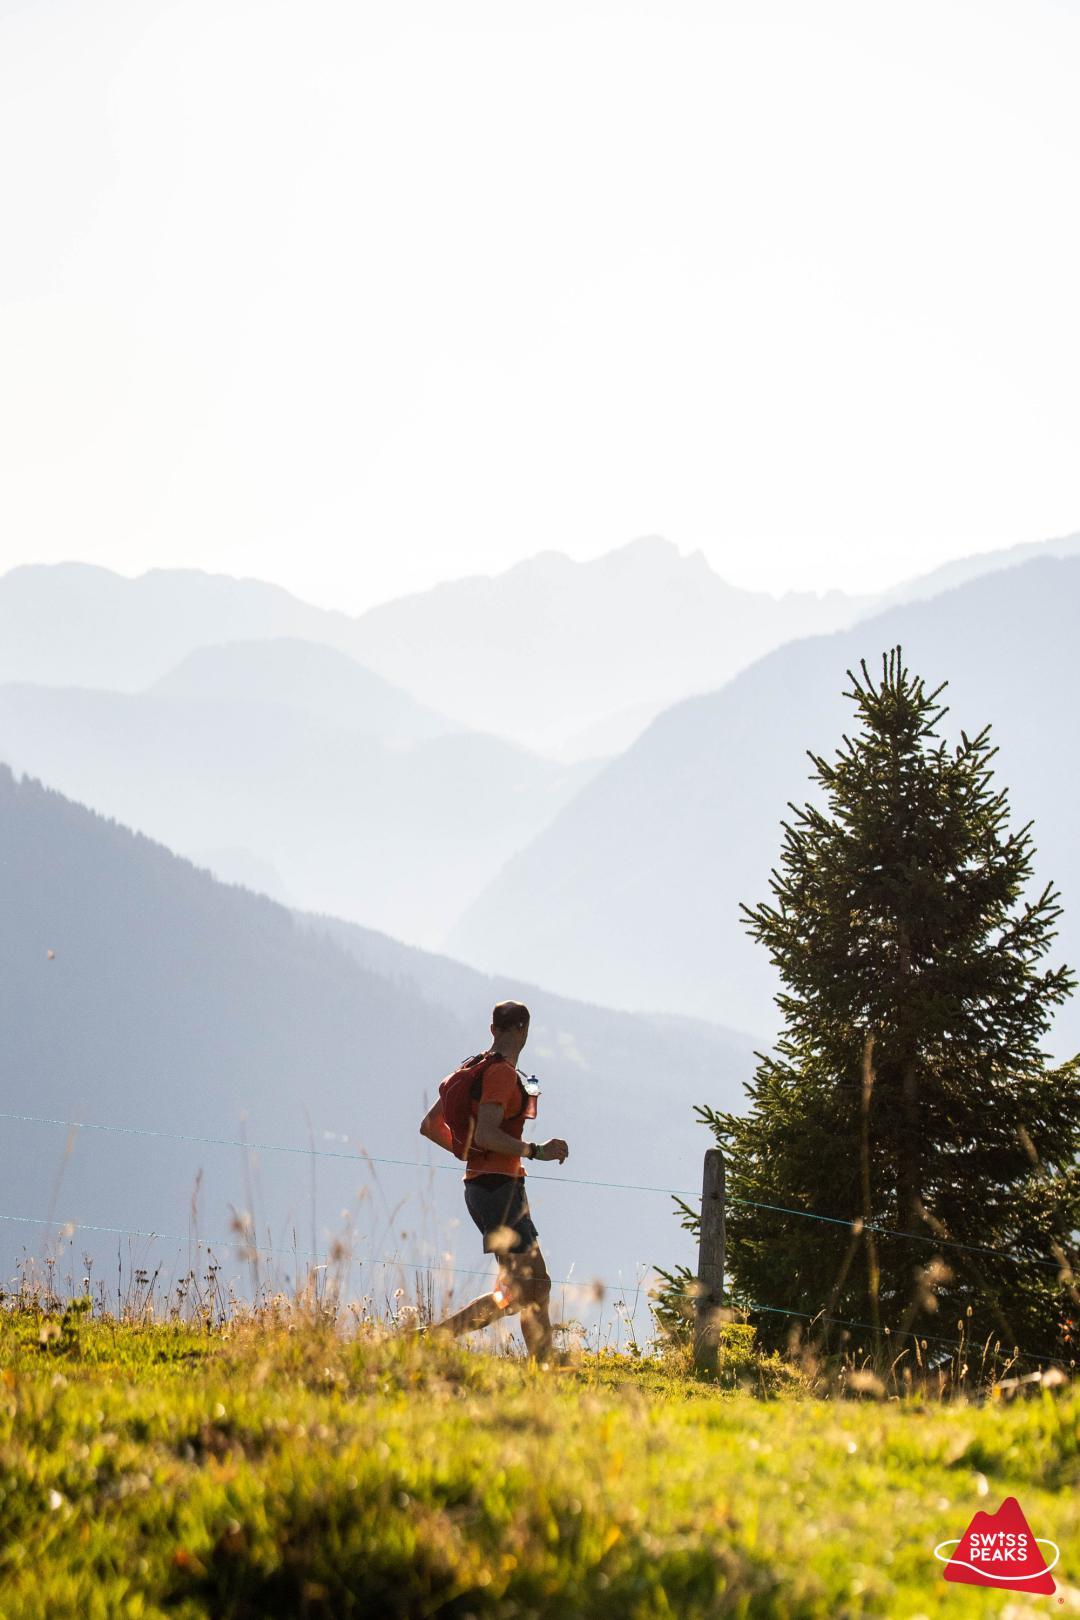 SwissPeaks Trail_Coureur ambiance.jpg